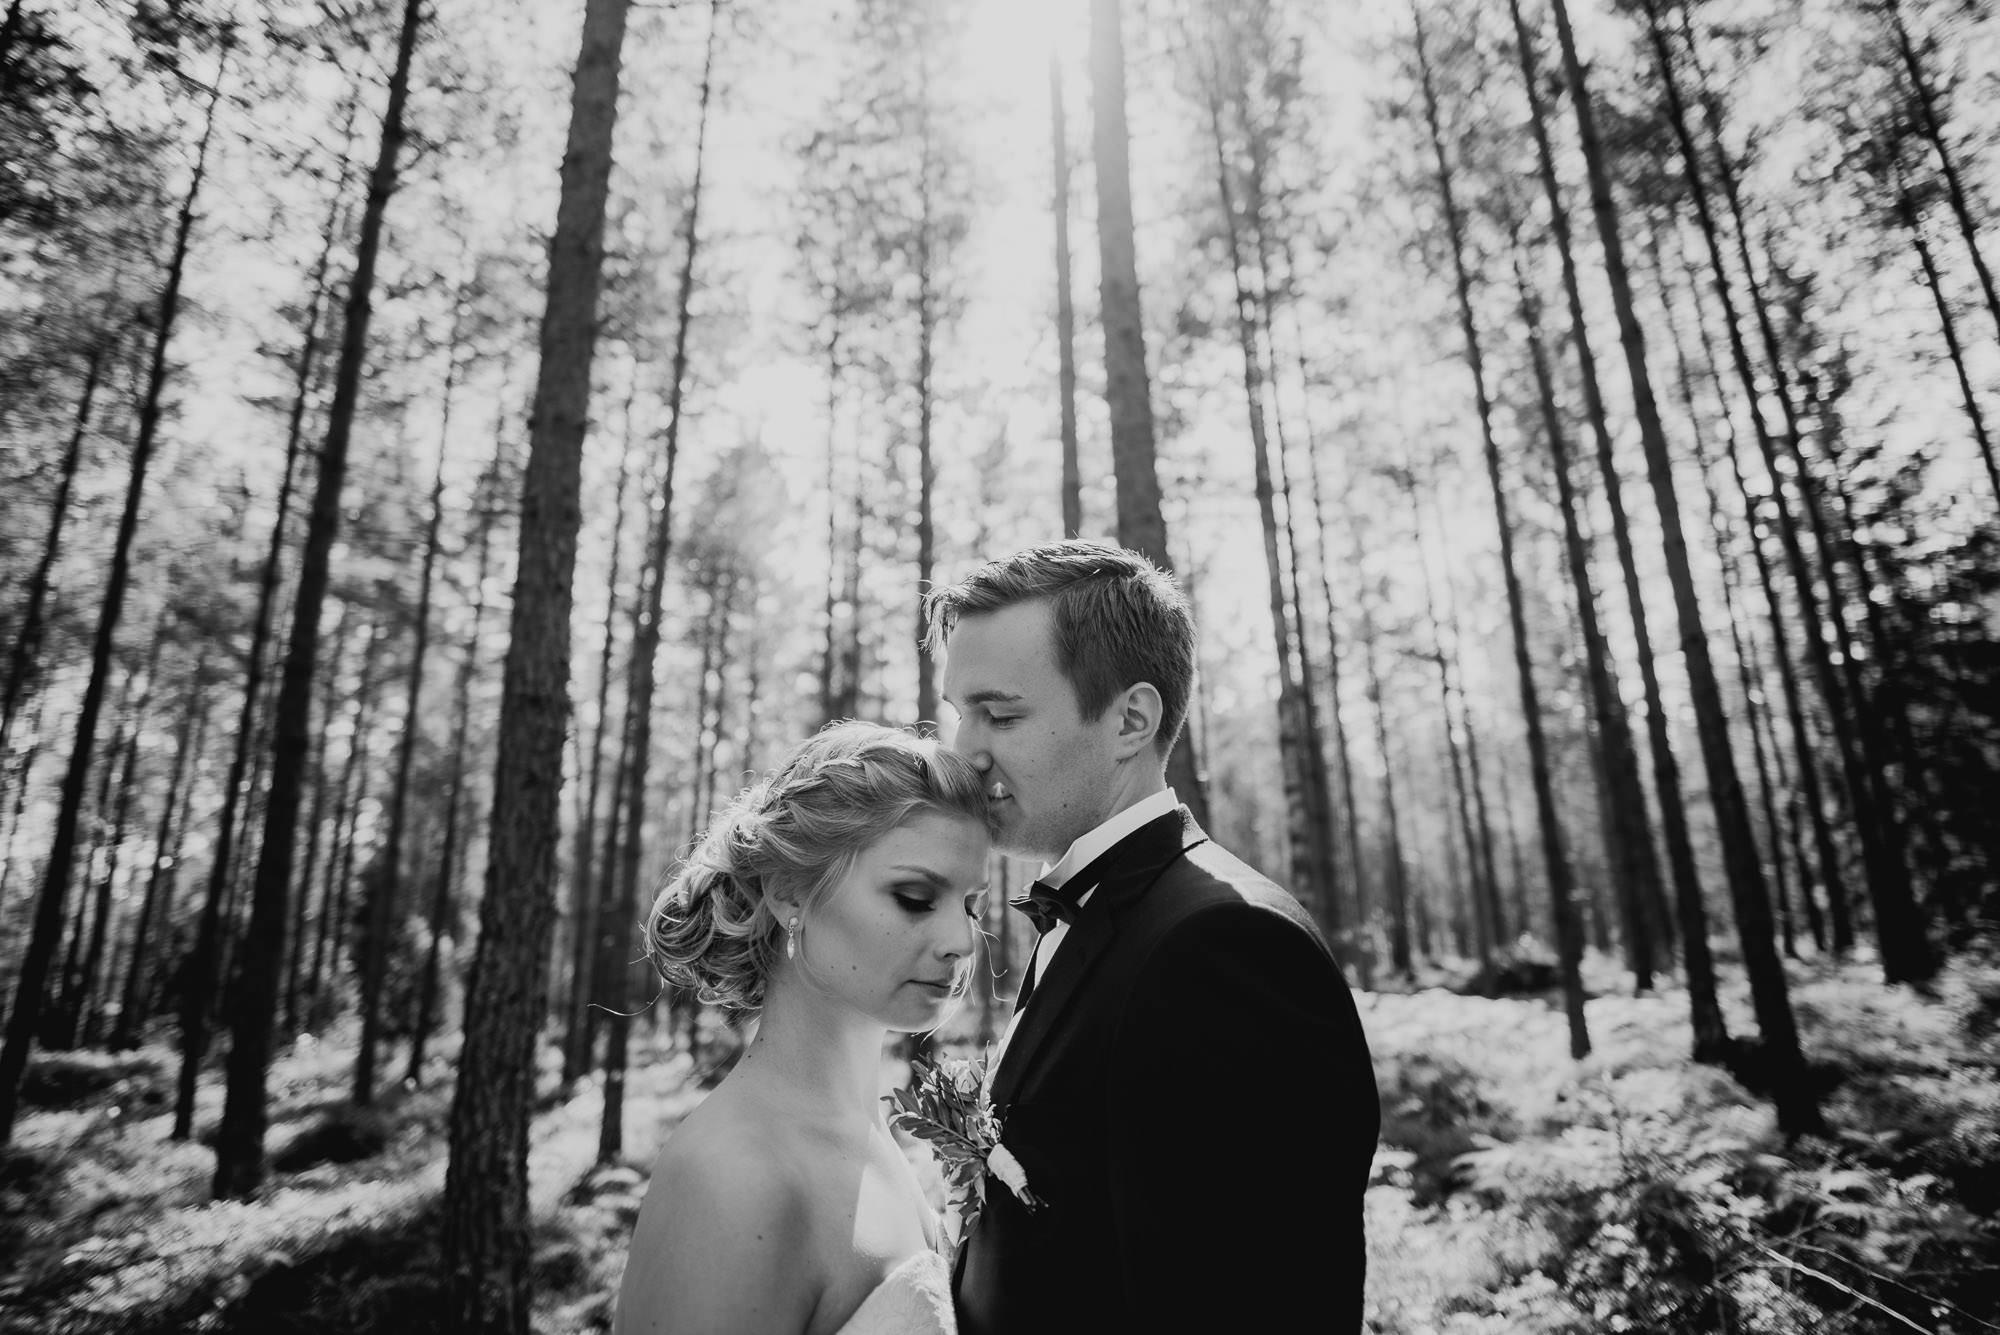 rabbit_visuals_haavideo_wedding_videography_el-012.jpg